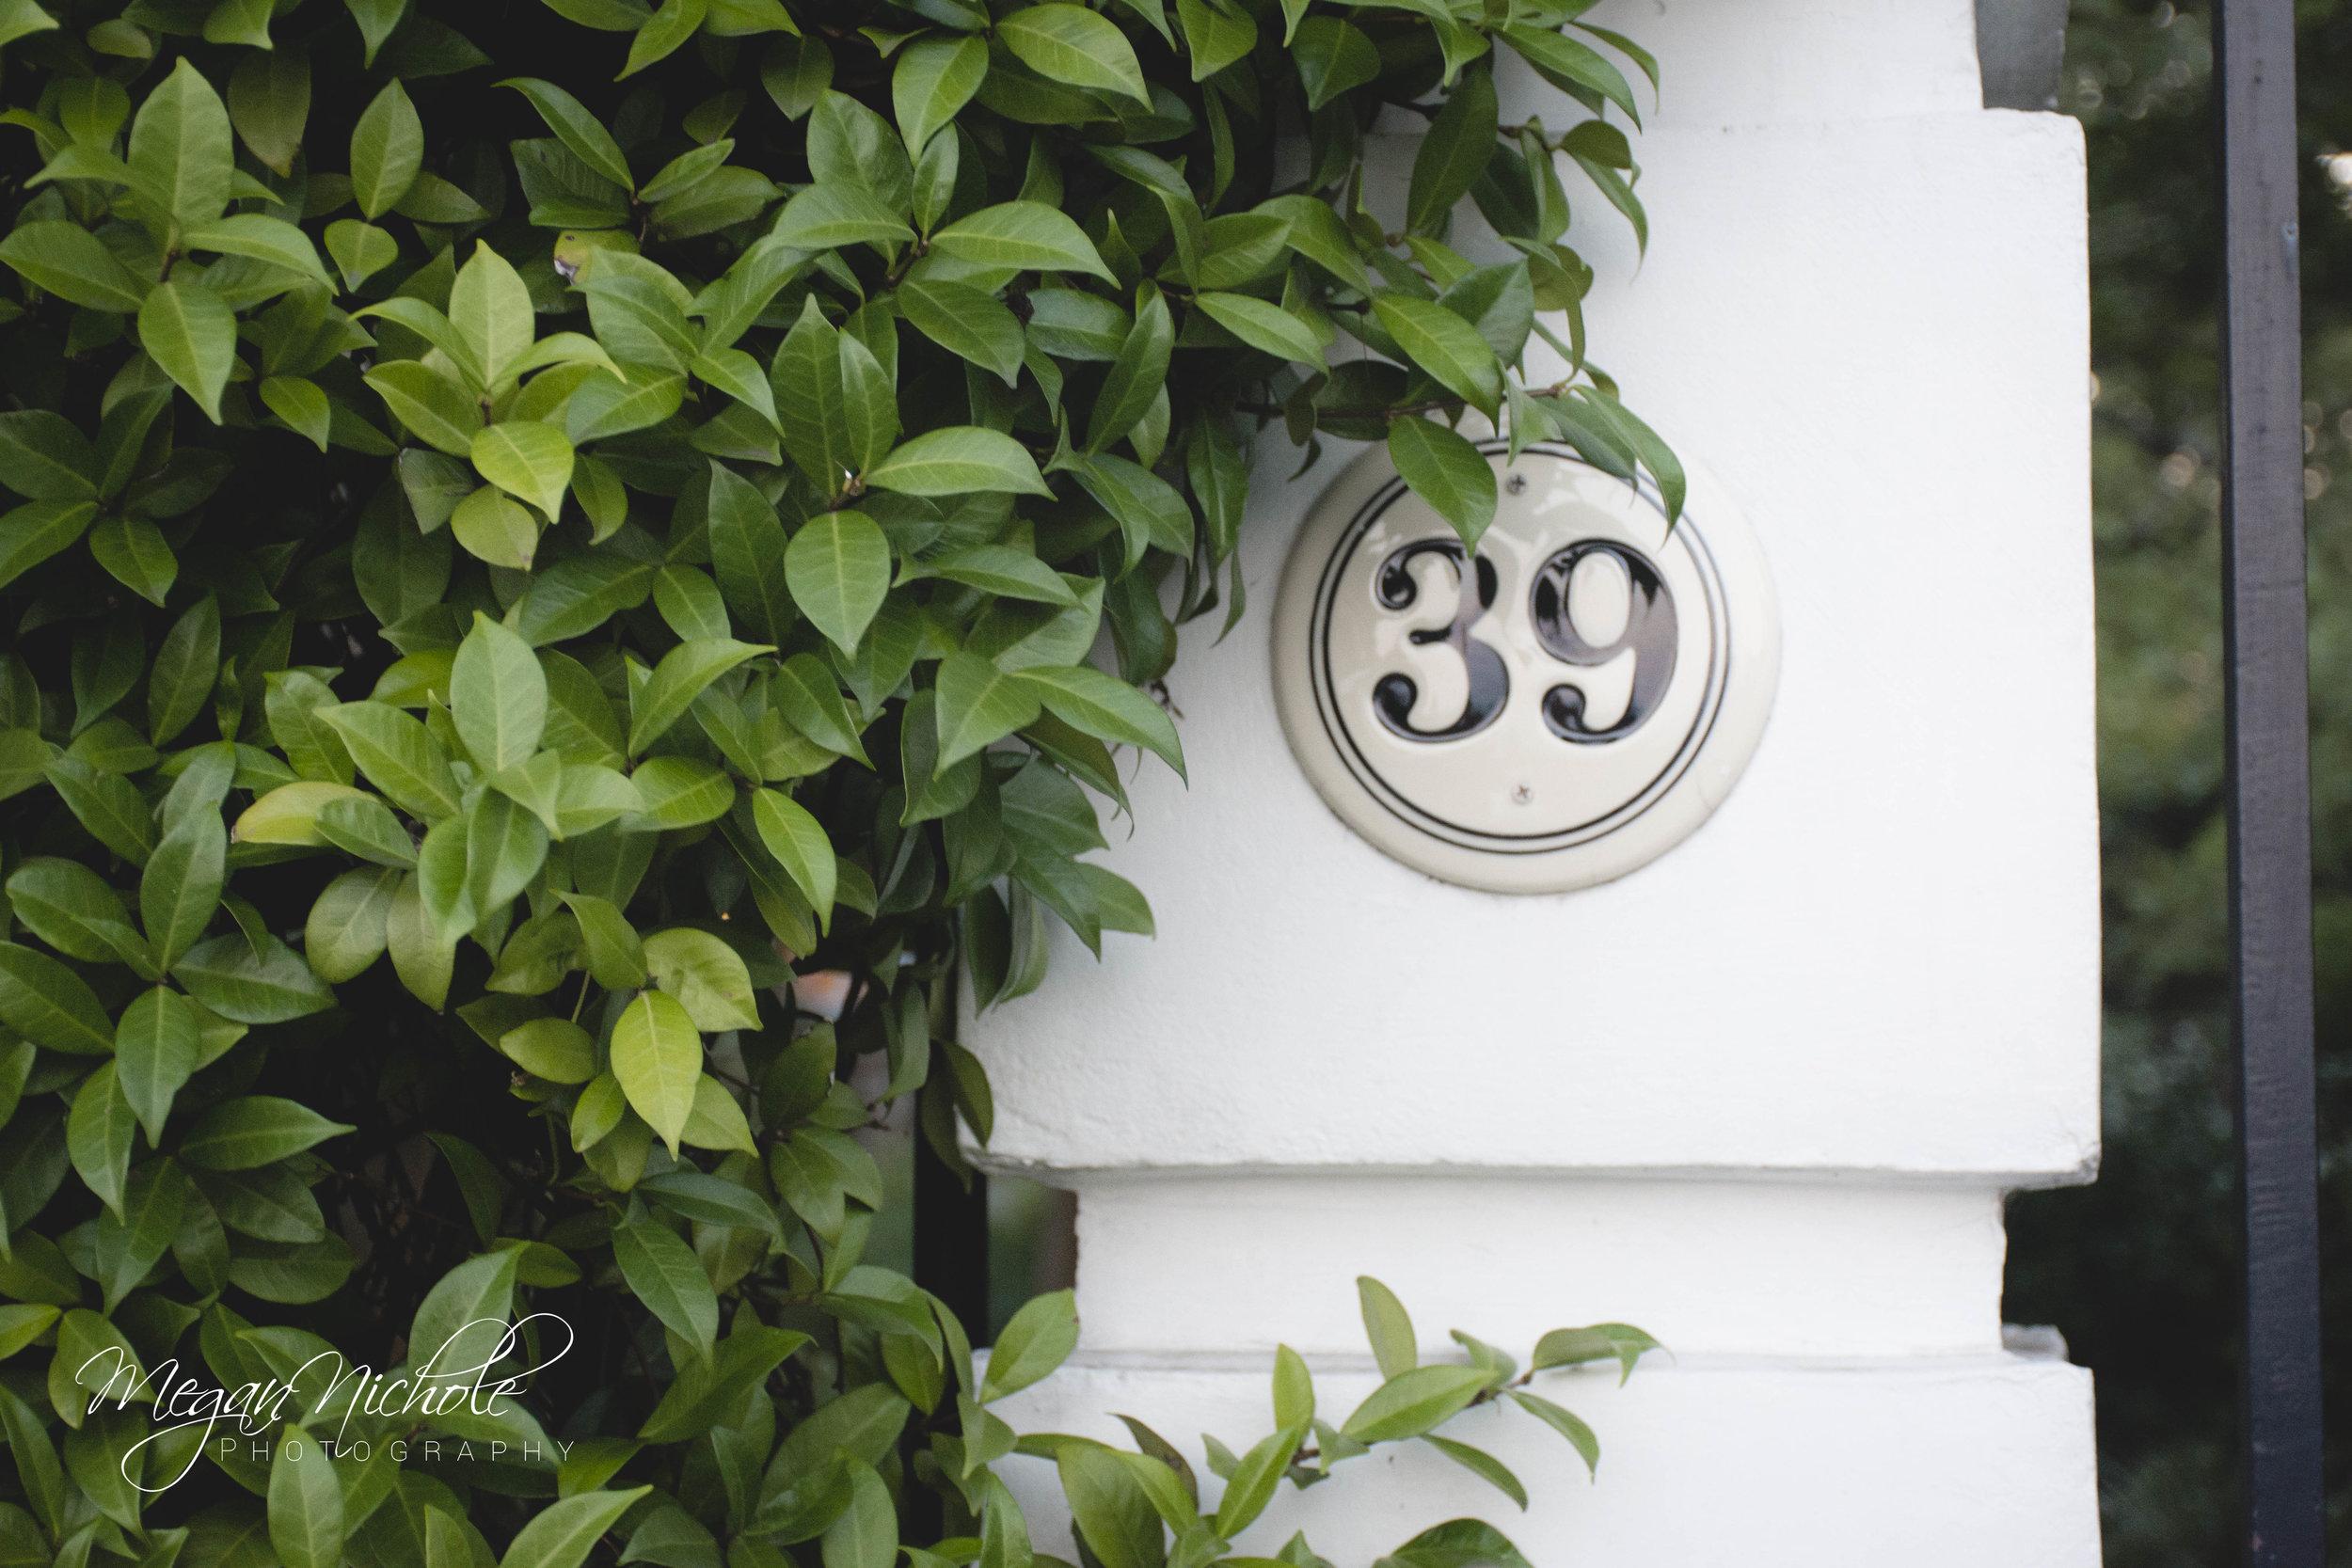 Charleston home house numbers